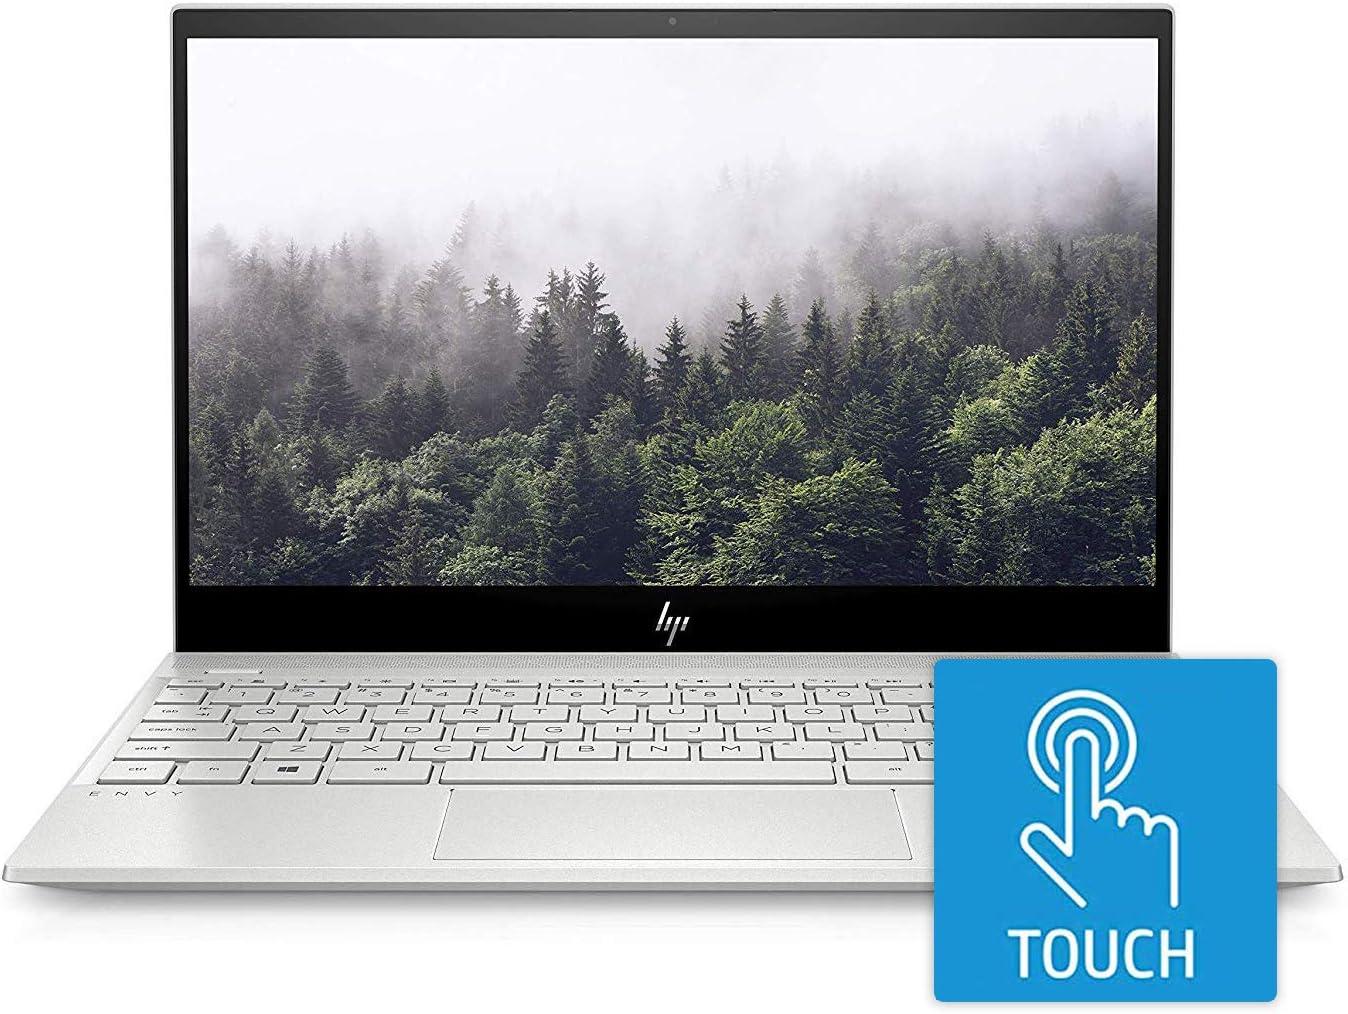 HP Envy 13.3 Inch 4K IPS Laptop Intel Quad Core i7 4.6 GHz, 16GB RAM, 1TB PCIe SSD, NVIDIA GeForce MX250